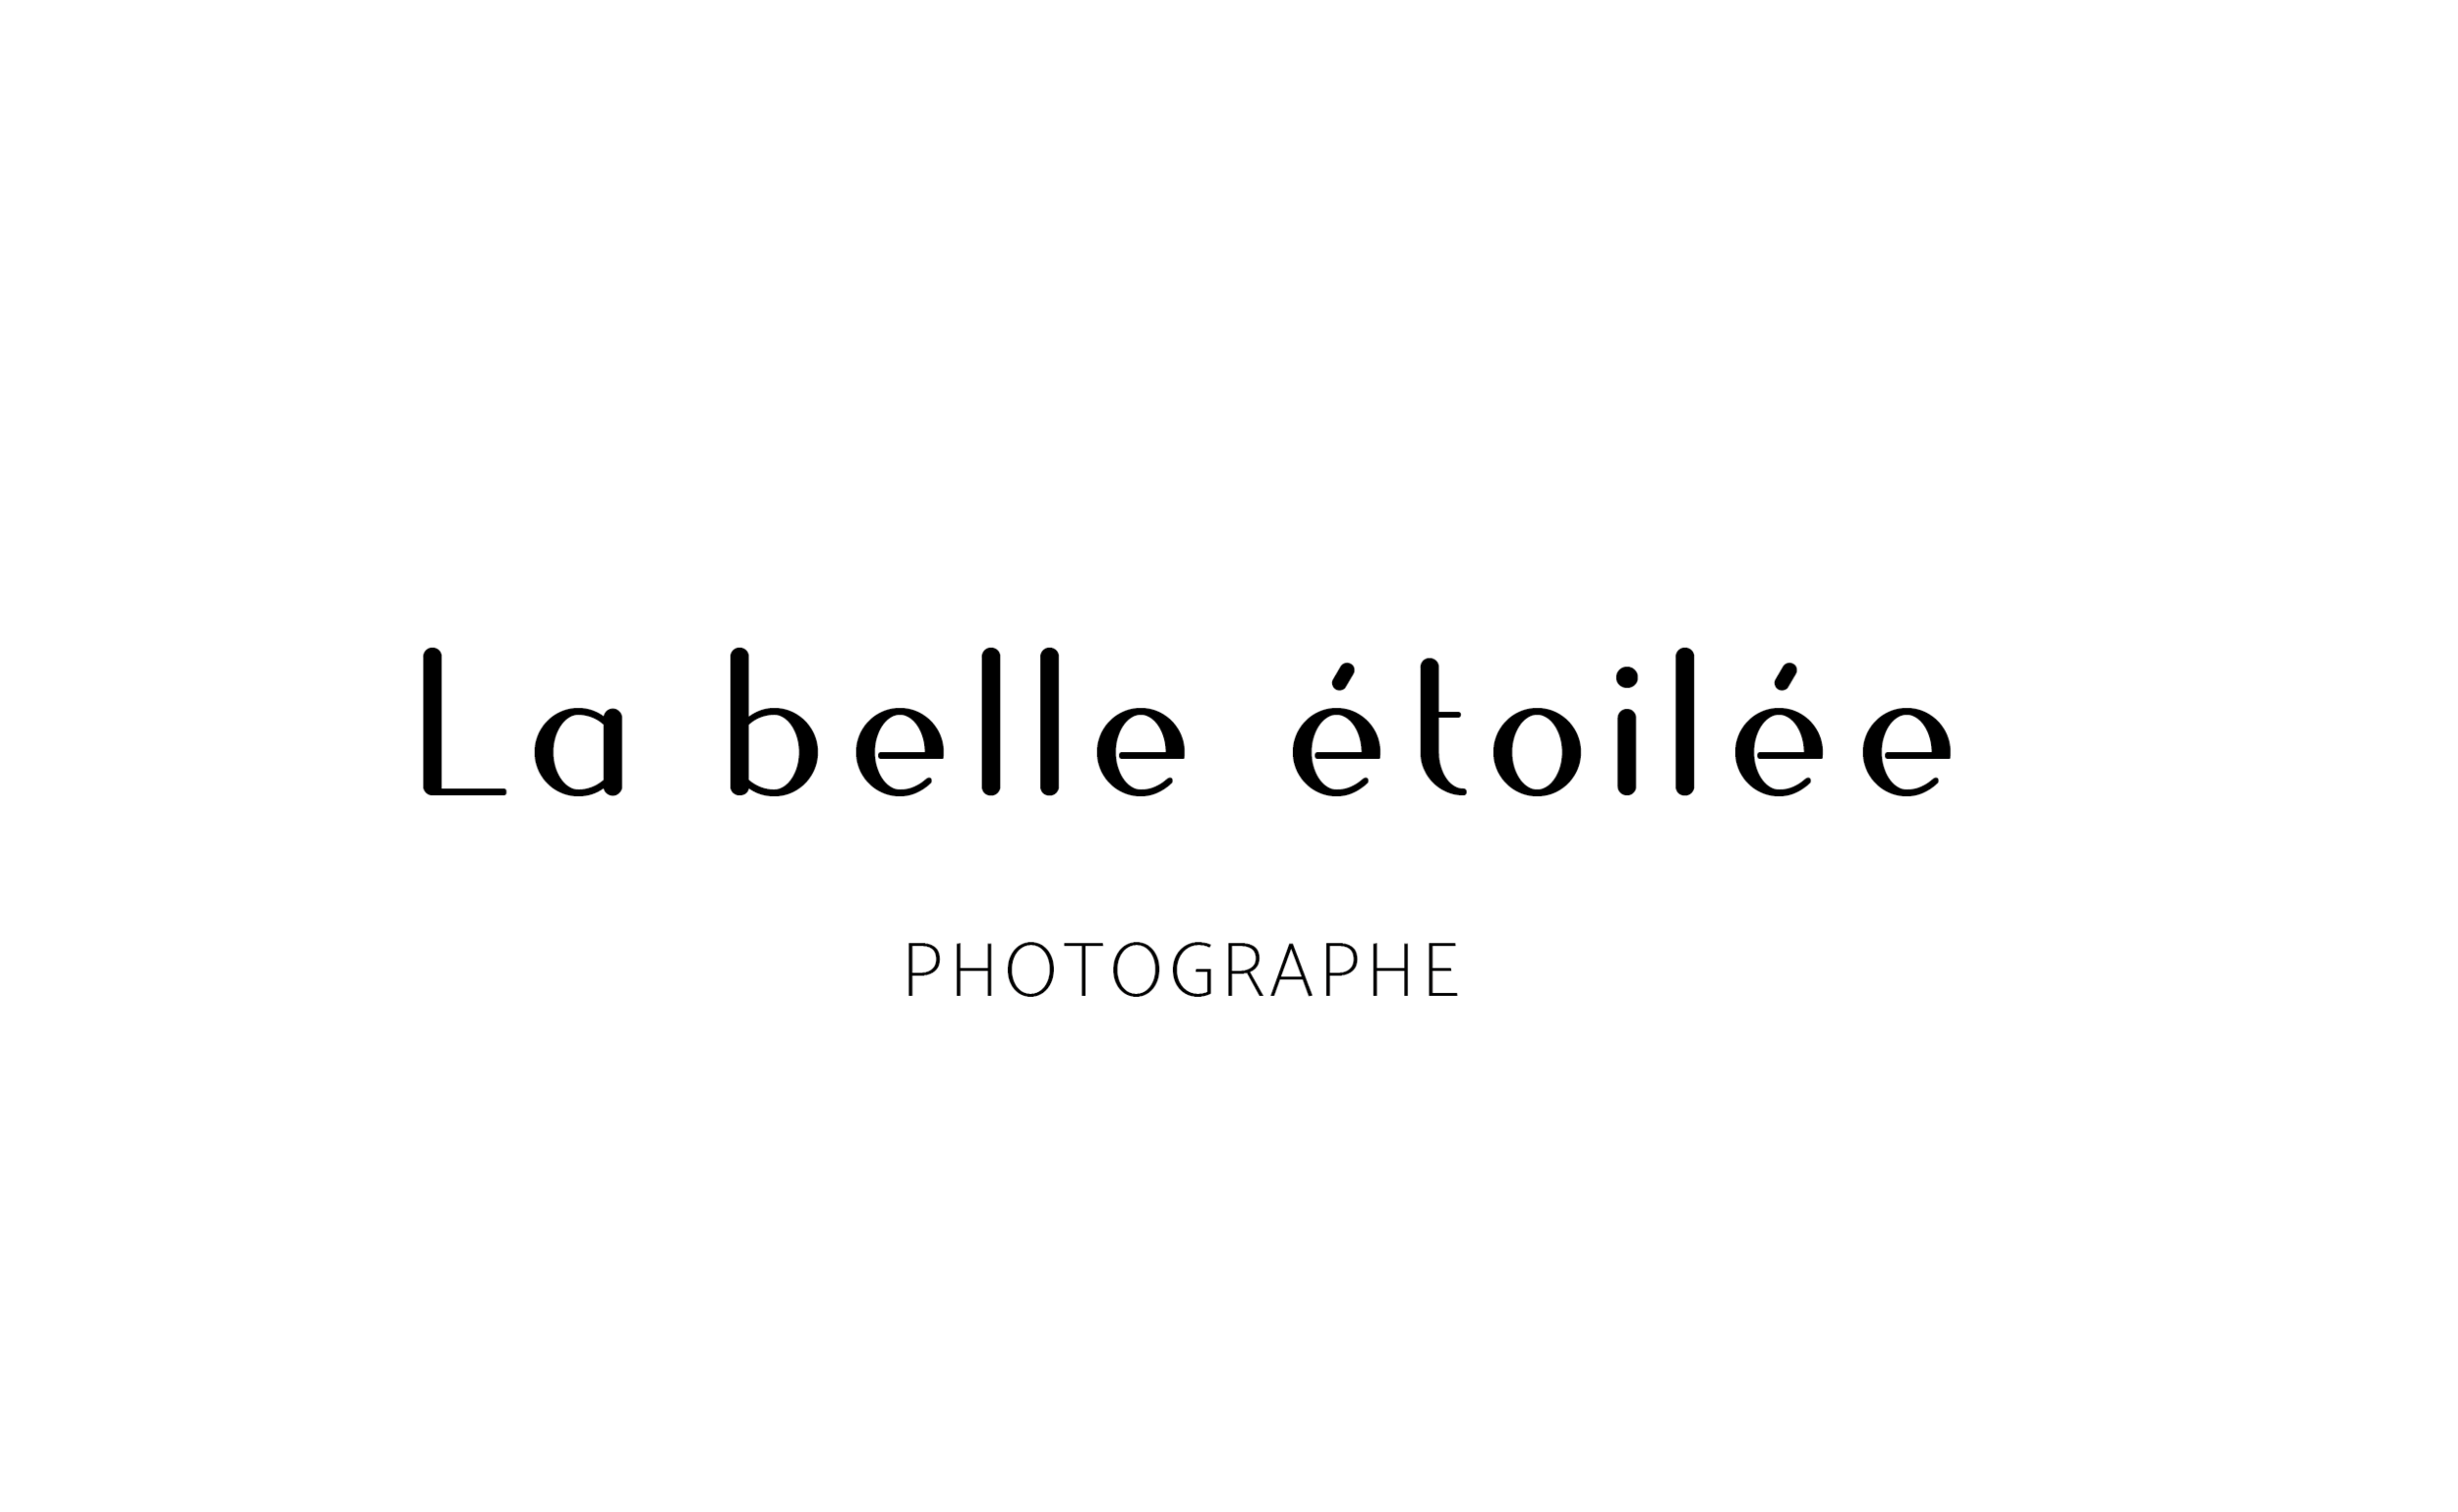 Labelleetoilee_Galerie.victorinepiot.com.png